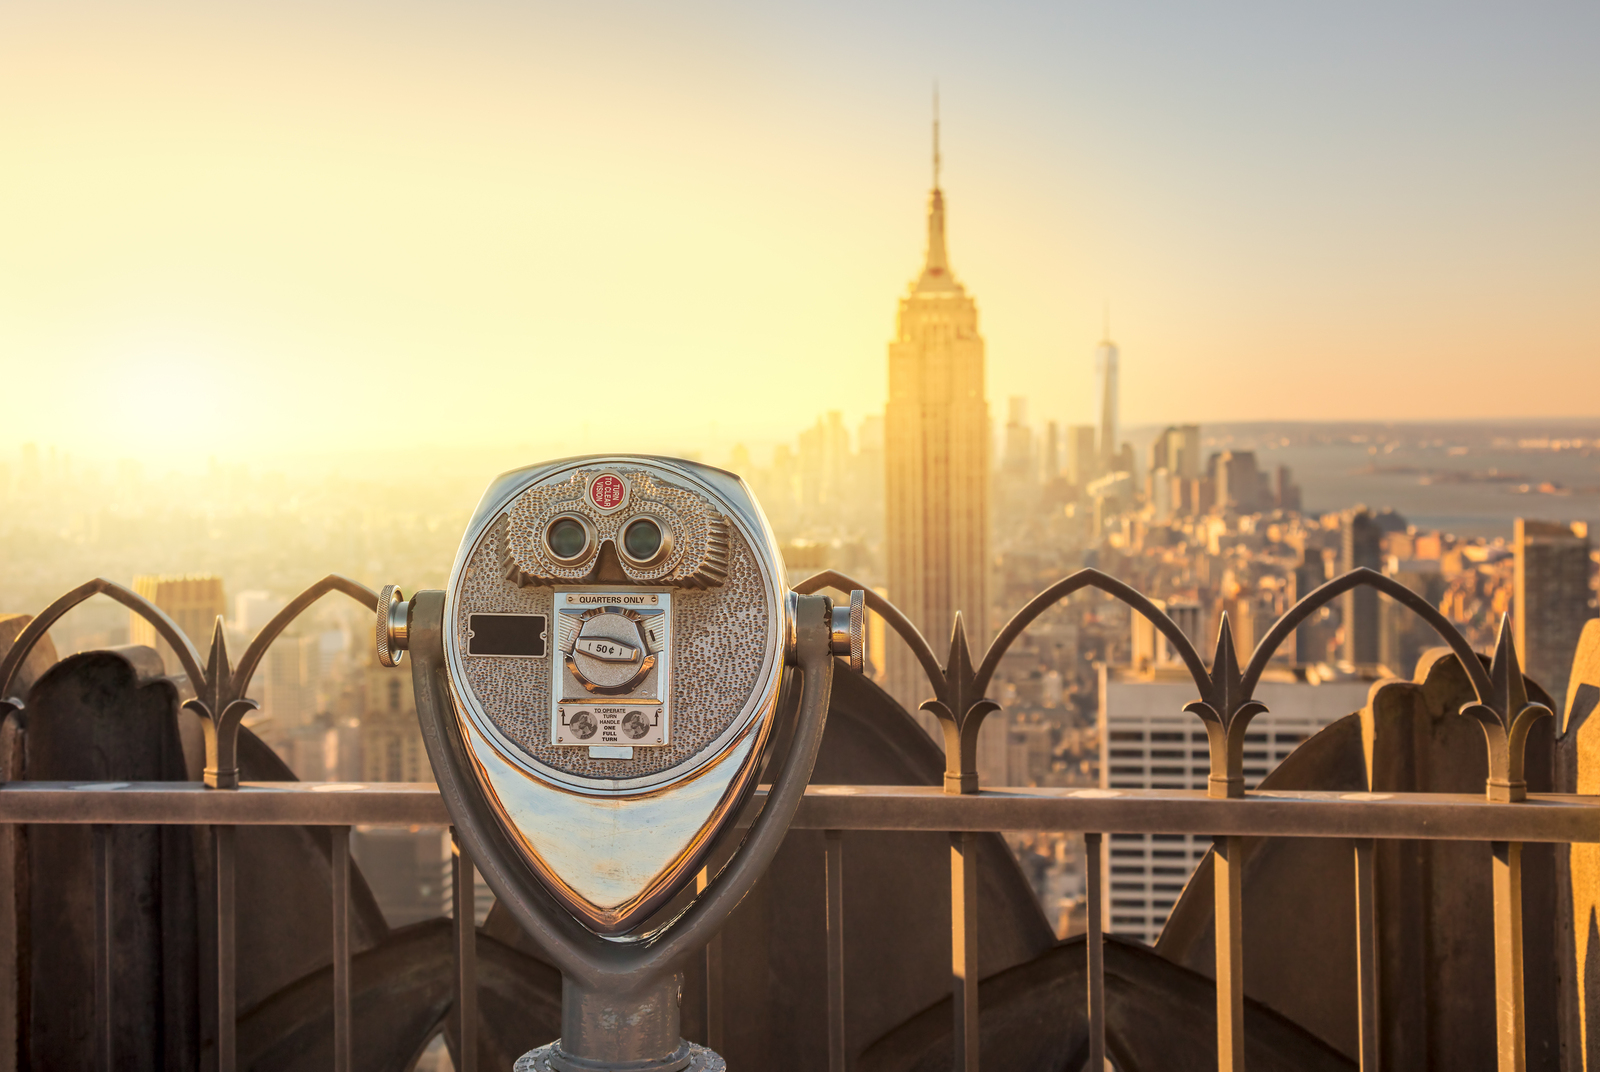 bigstock-Tourist-binoculars-overlooking-142692422.jpg